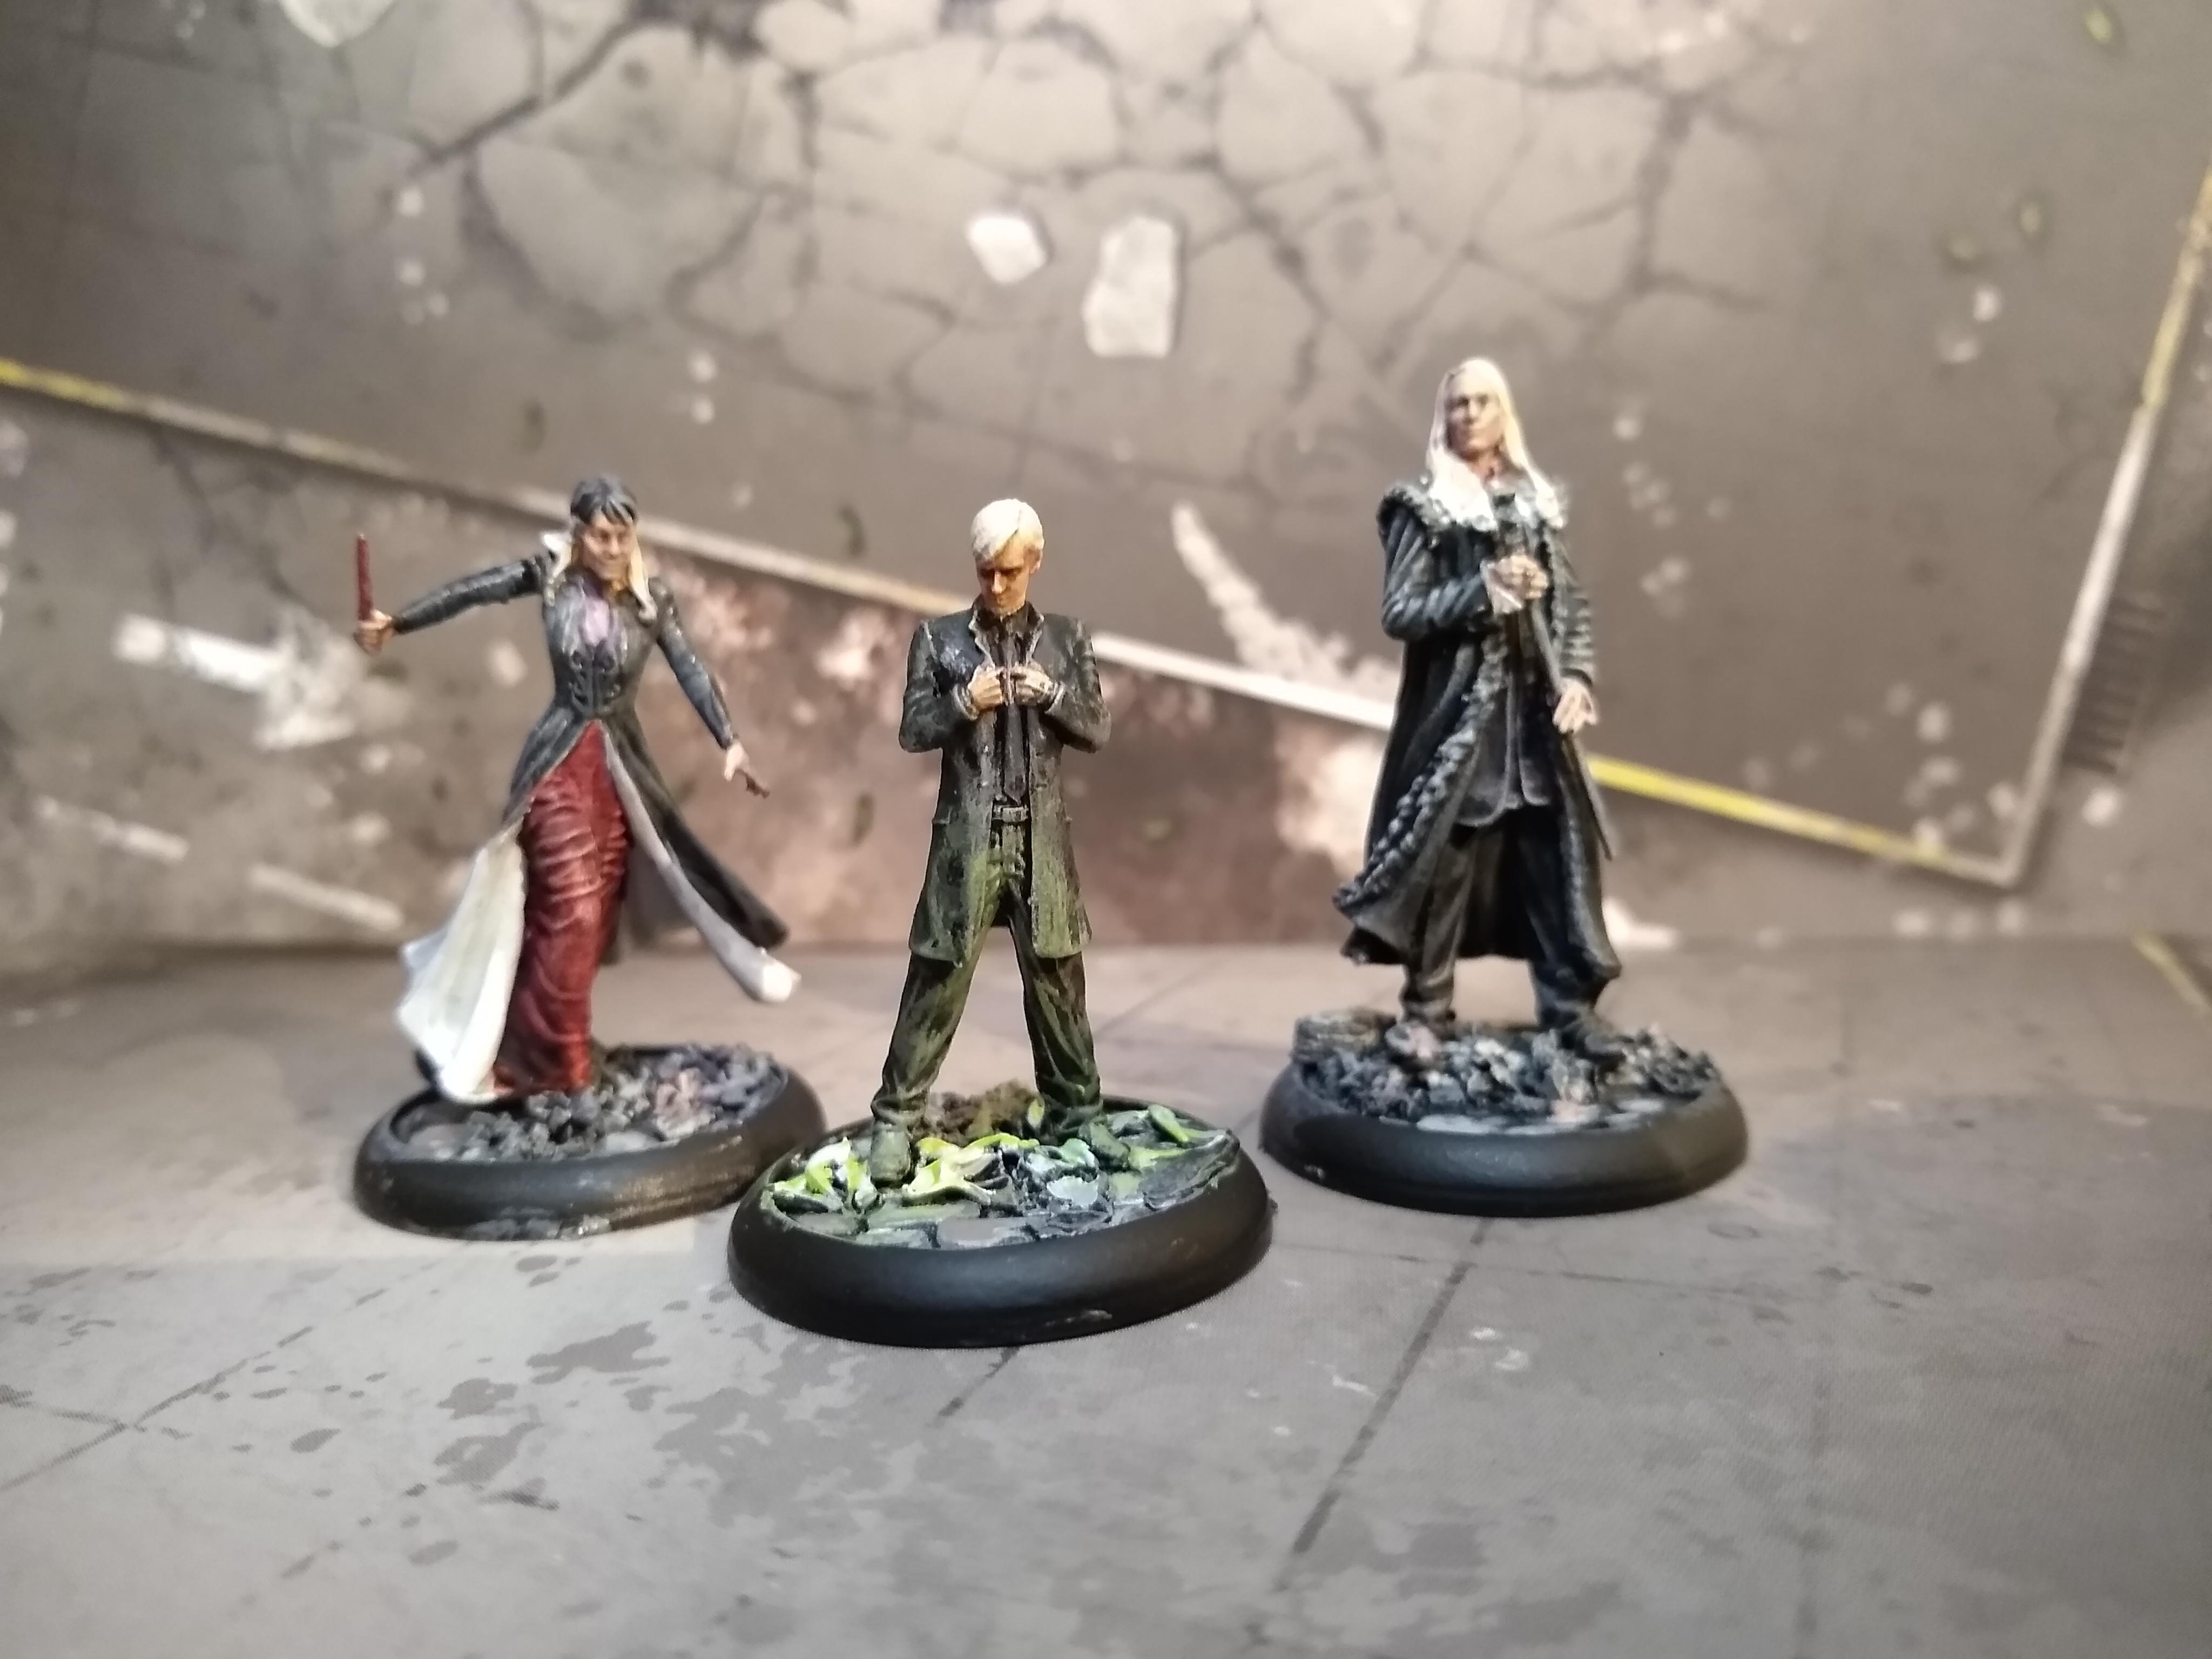 Malfoy family a